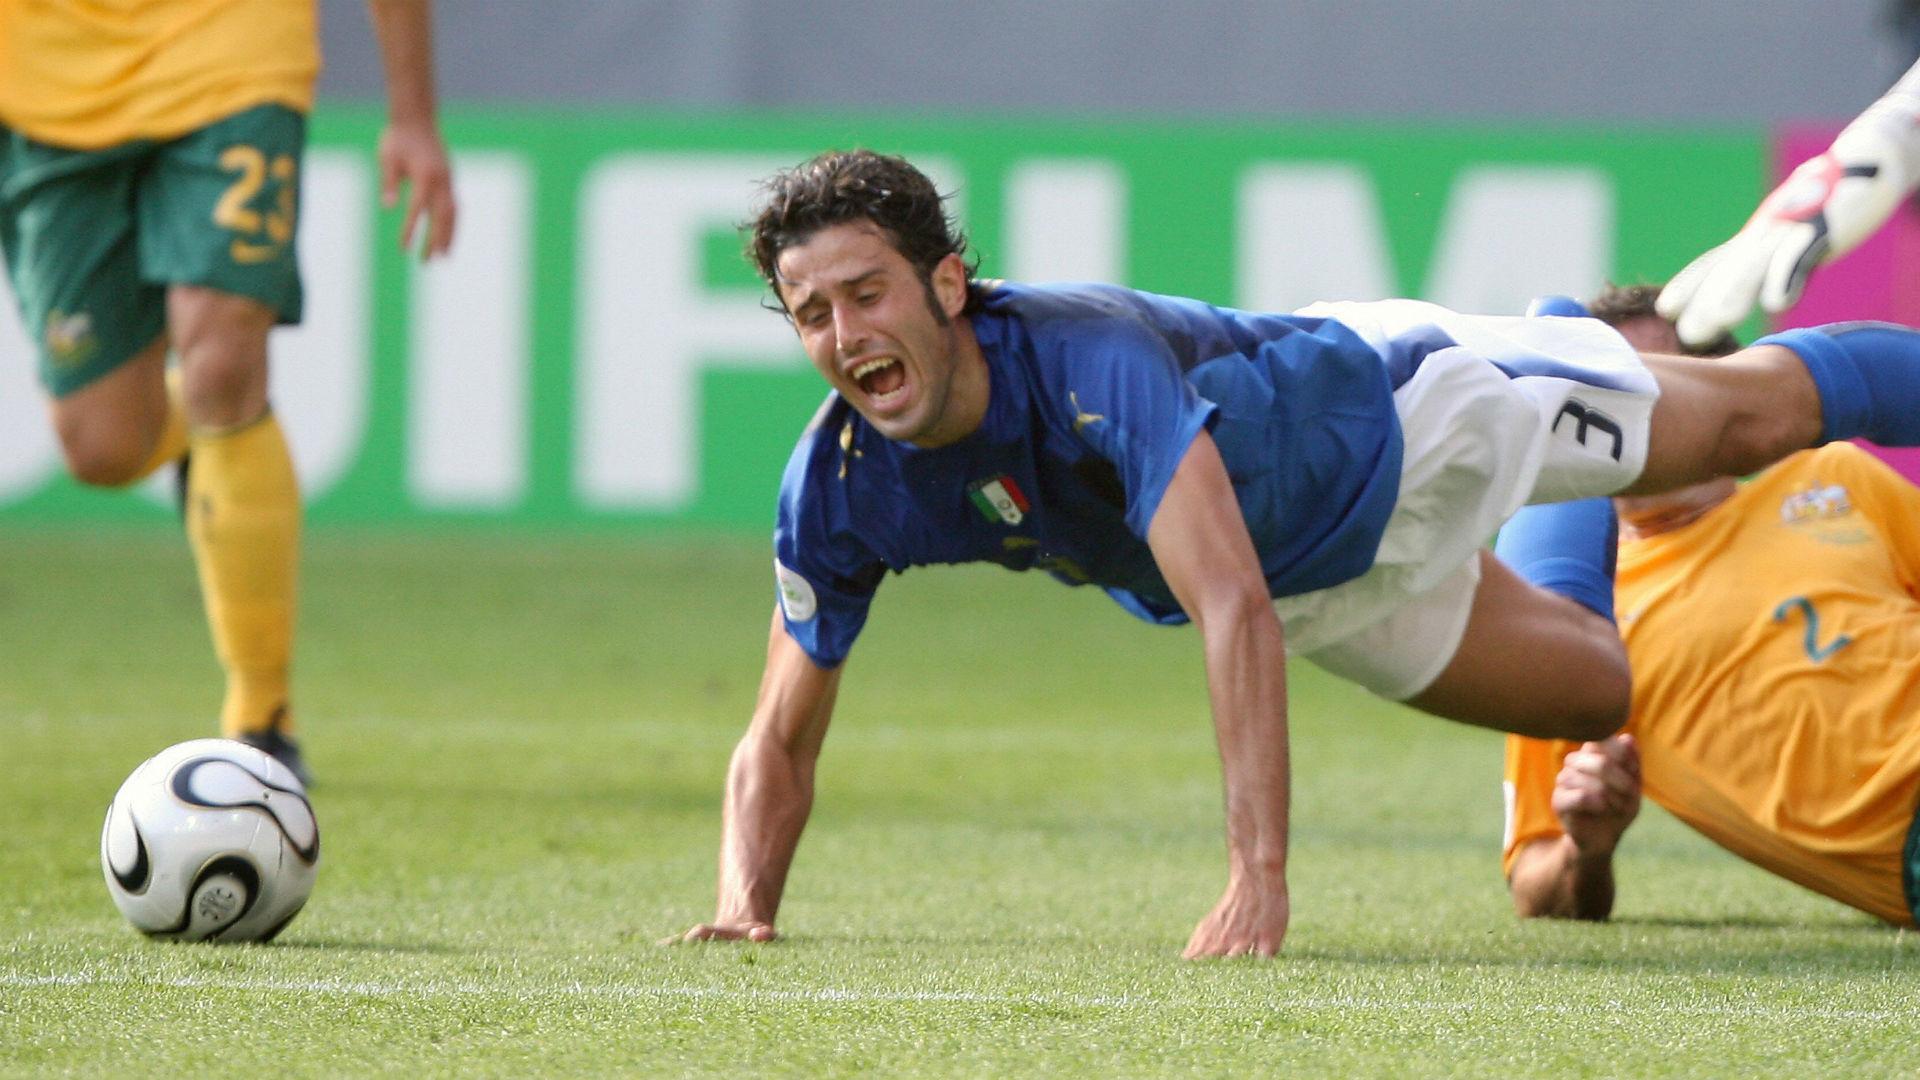 Grosso Italia Australia Copa do Mundo 2006